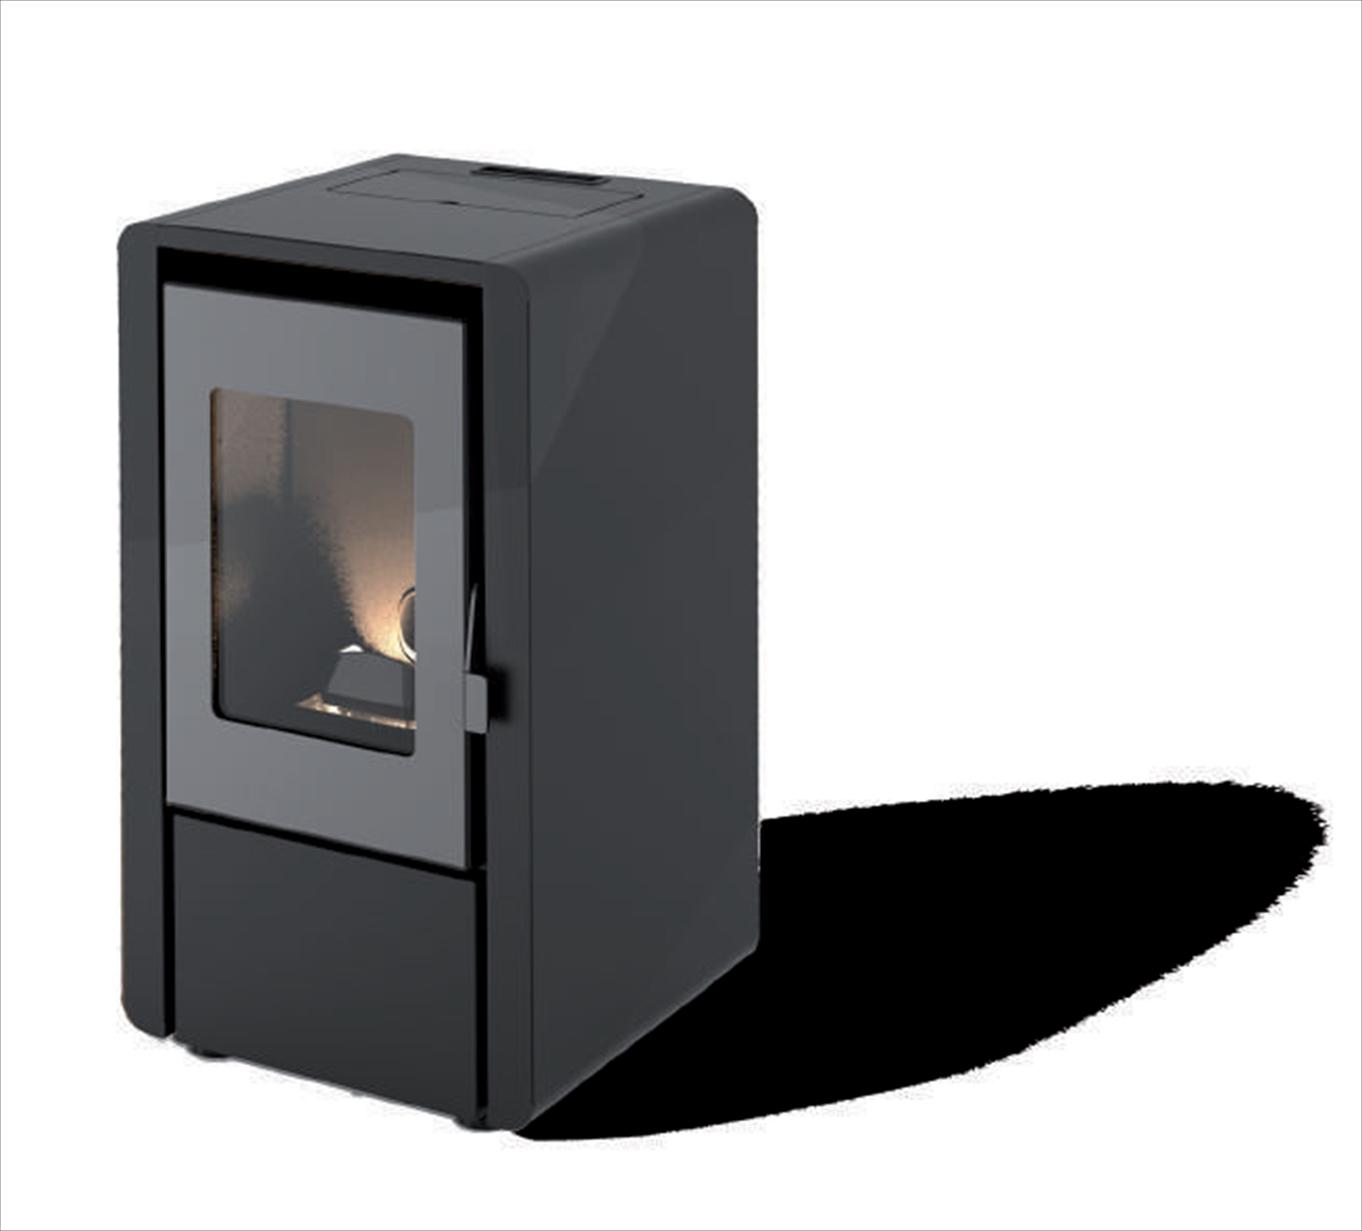 kalor po le a granul s petite 6 avec 6 kw ebay. Black Bedroom Furniture Sets. Home Design Ideas